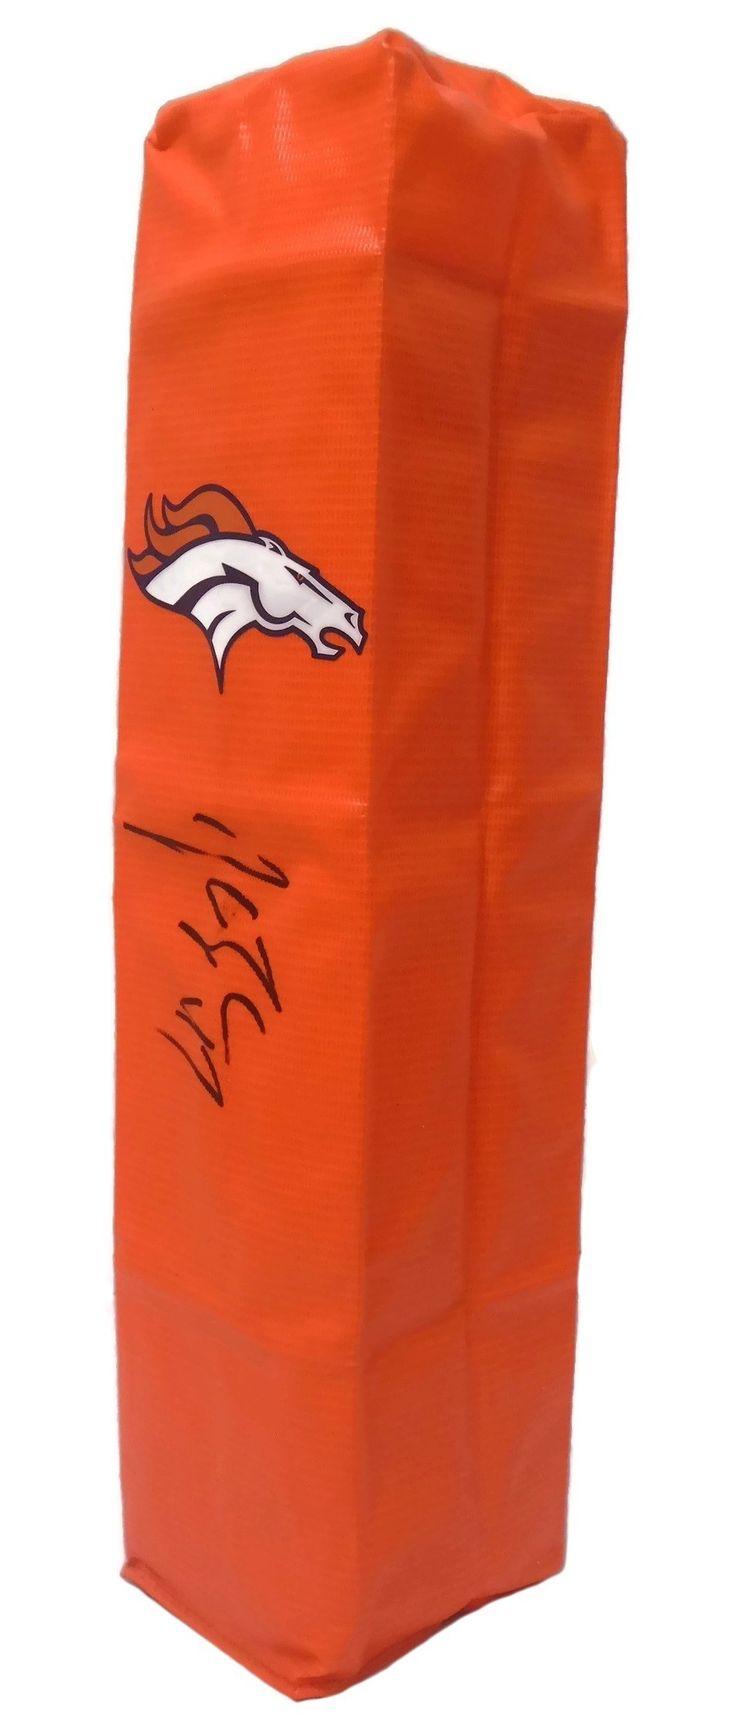 John Lynch Autographed Denver Broncos Full Size Football End Zone Touchdown Pylon, Proof Photo